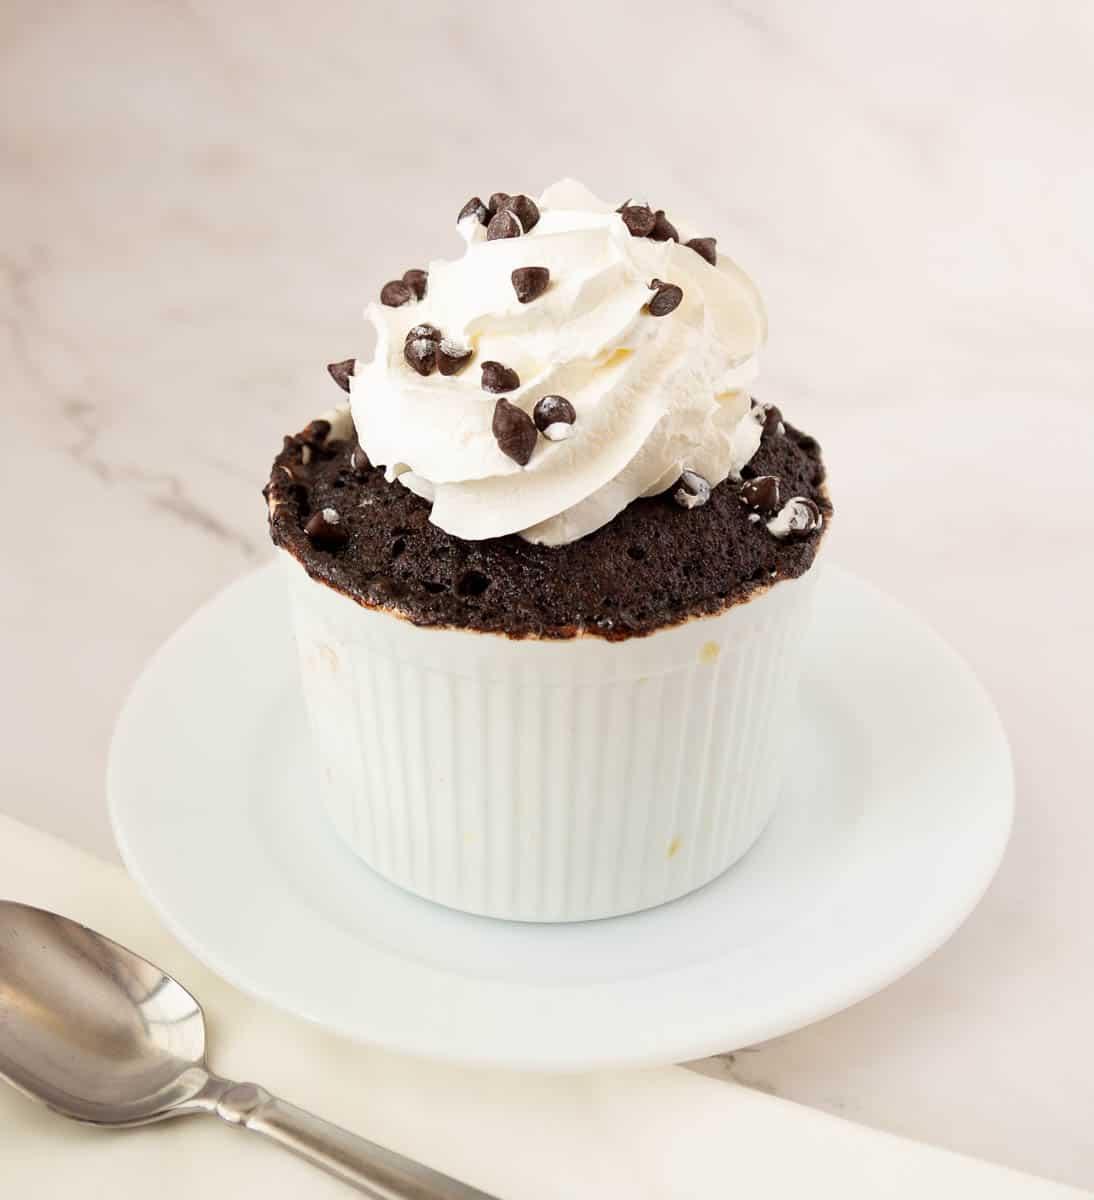 Mug cake topped with whipped cream.